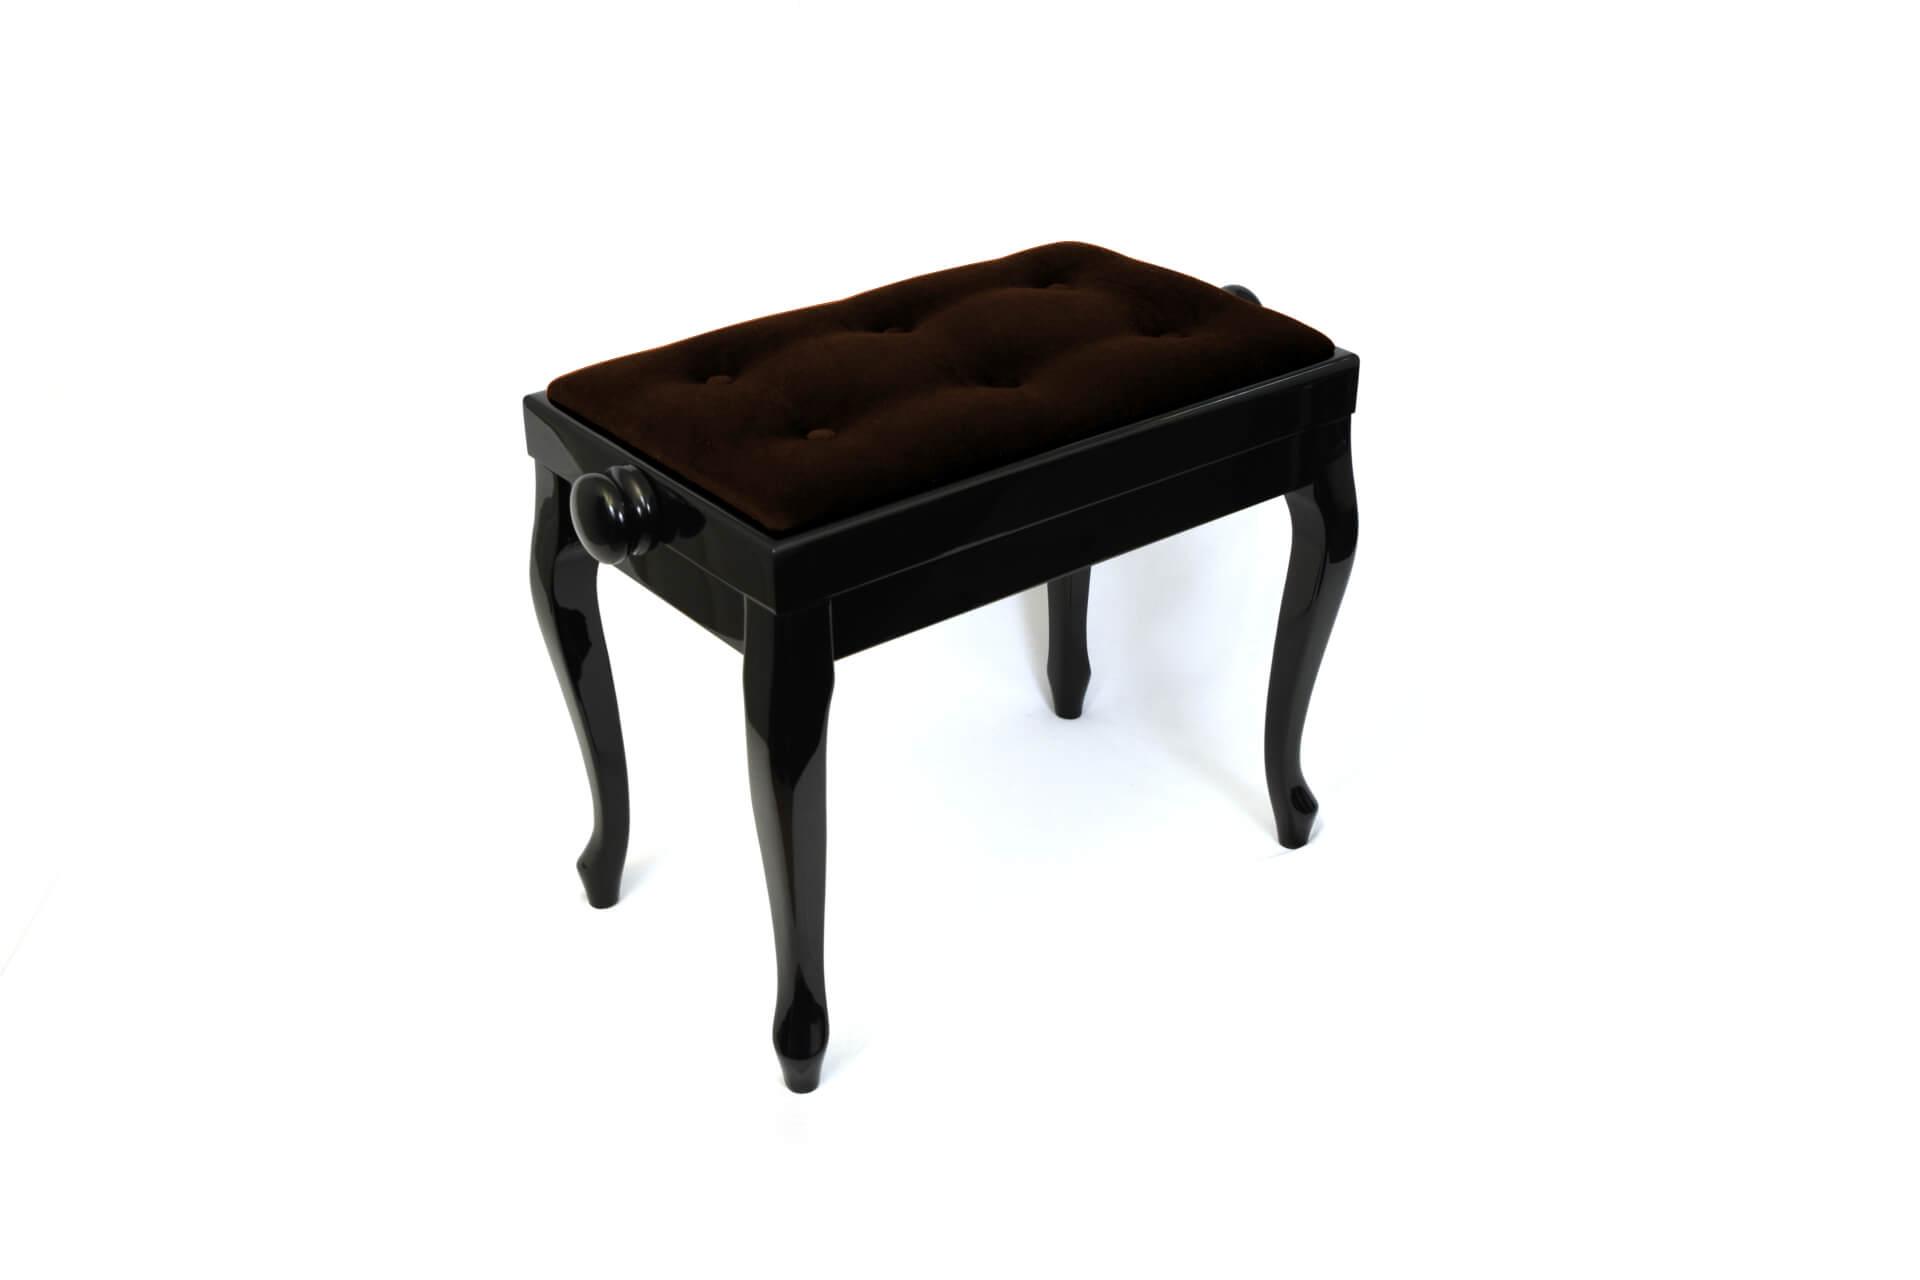 Terrific Small Bench For Piano Adjustable In Height Vivaldi Brown Machost Co Dining Chair Design Ideas Machostcouk